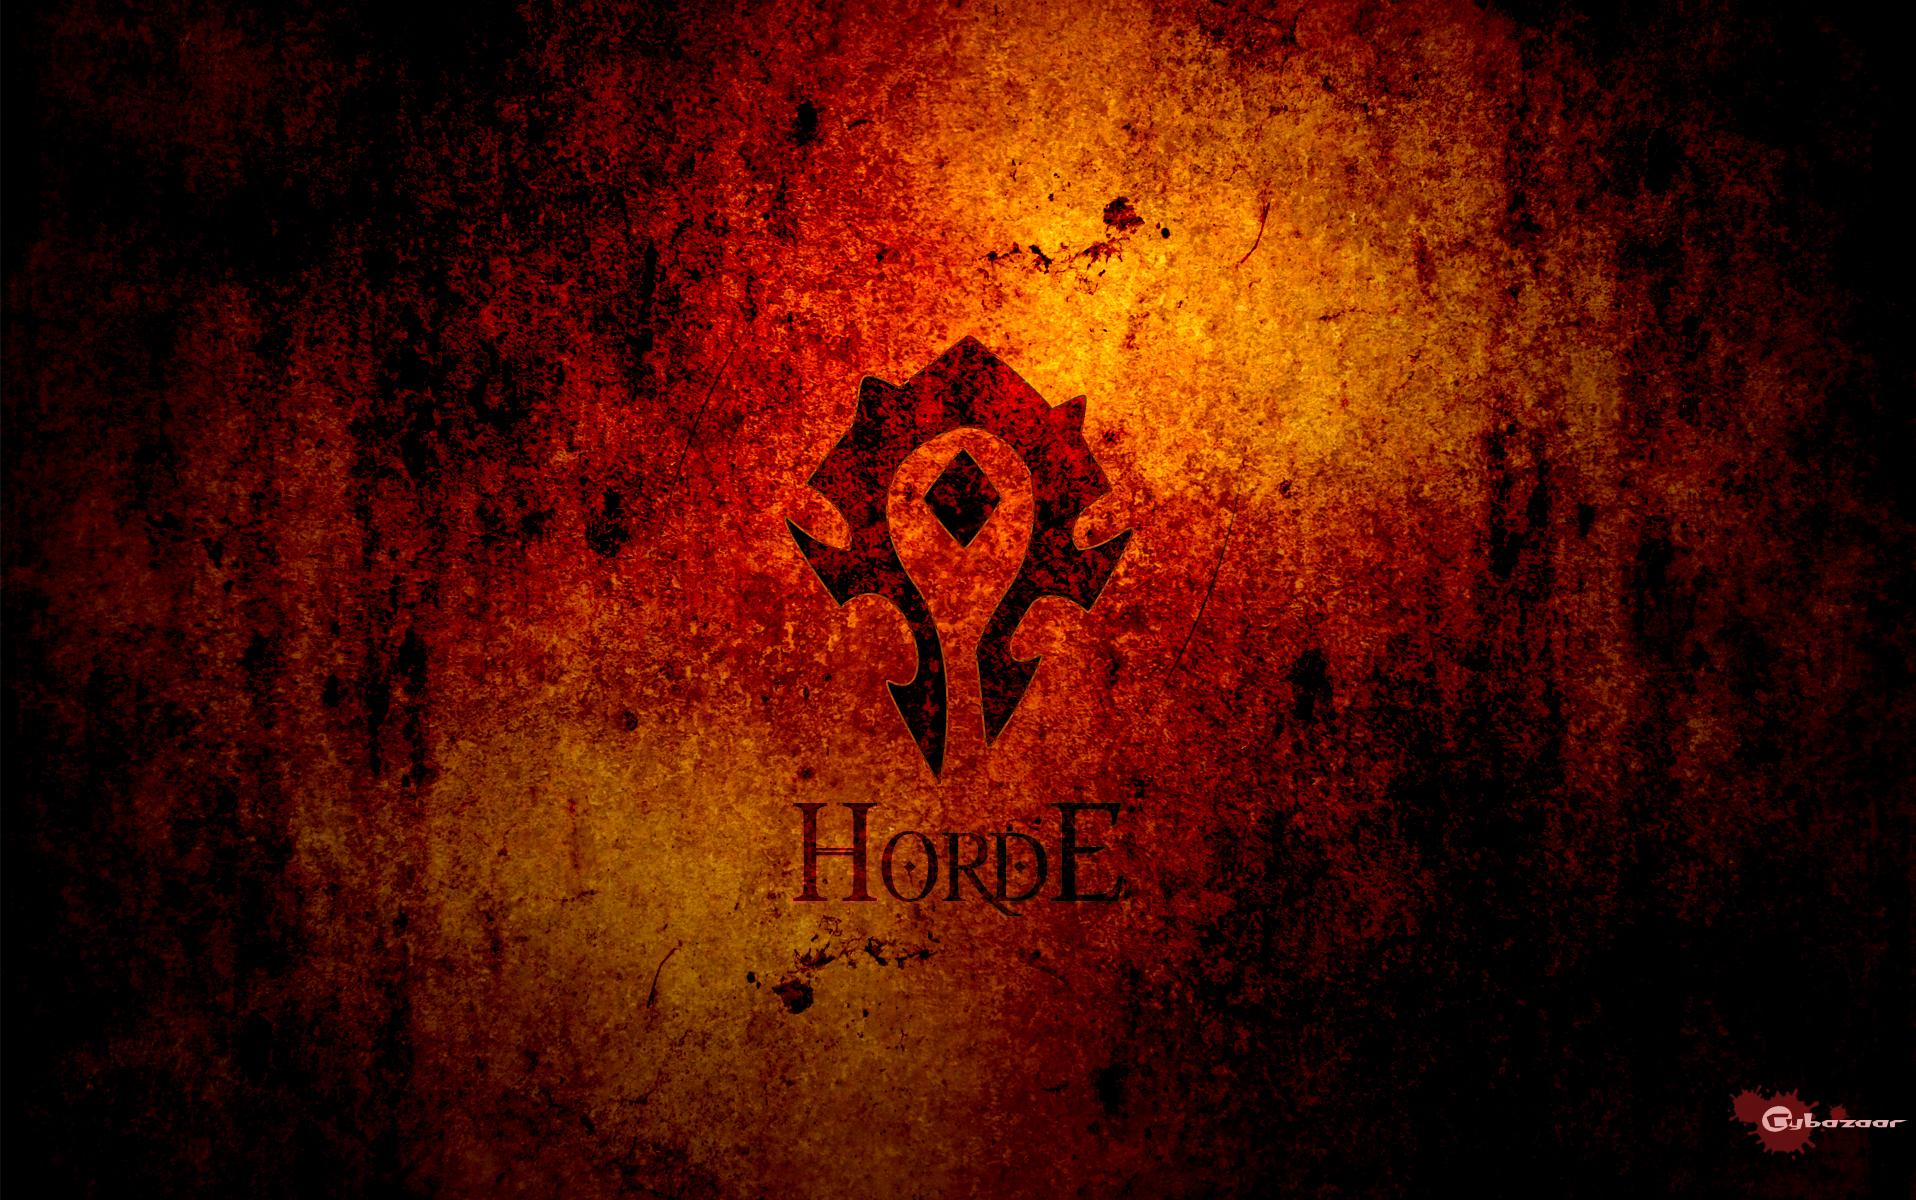 Horde Wallpaper Pack